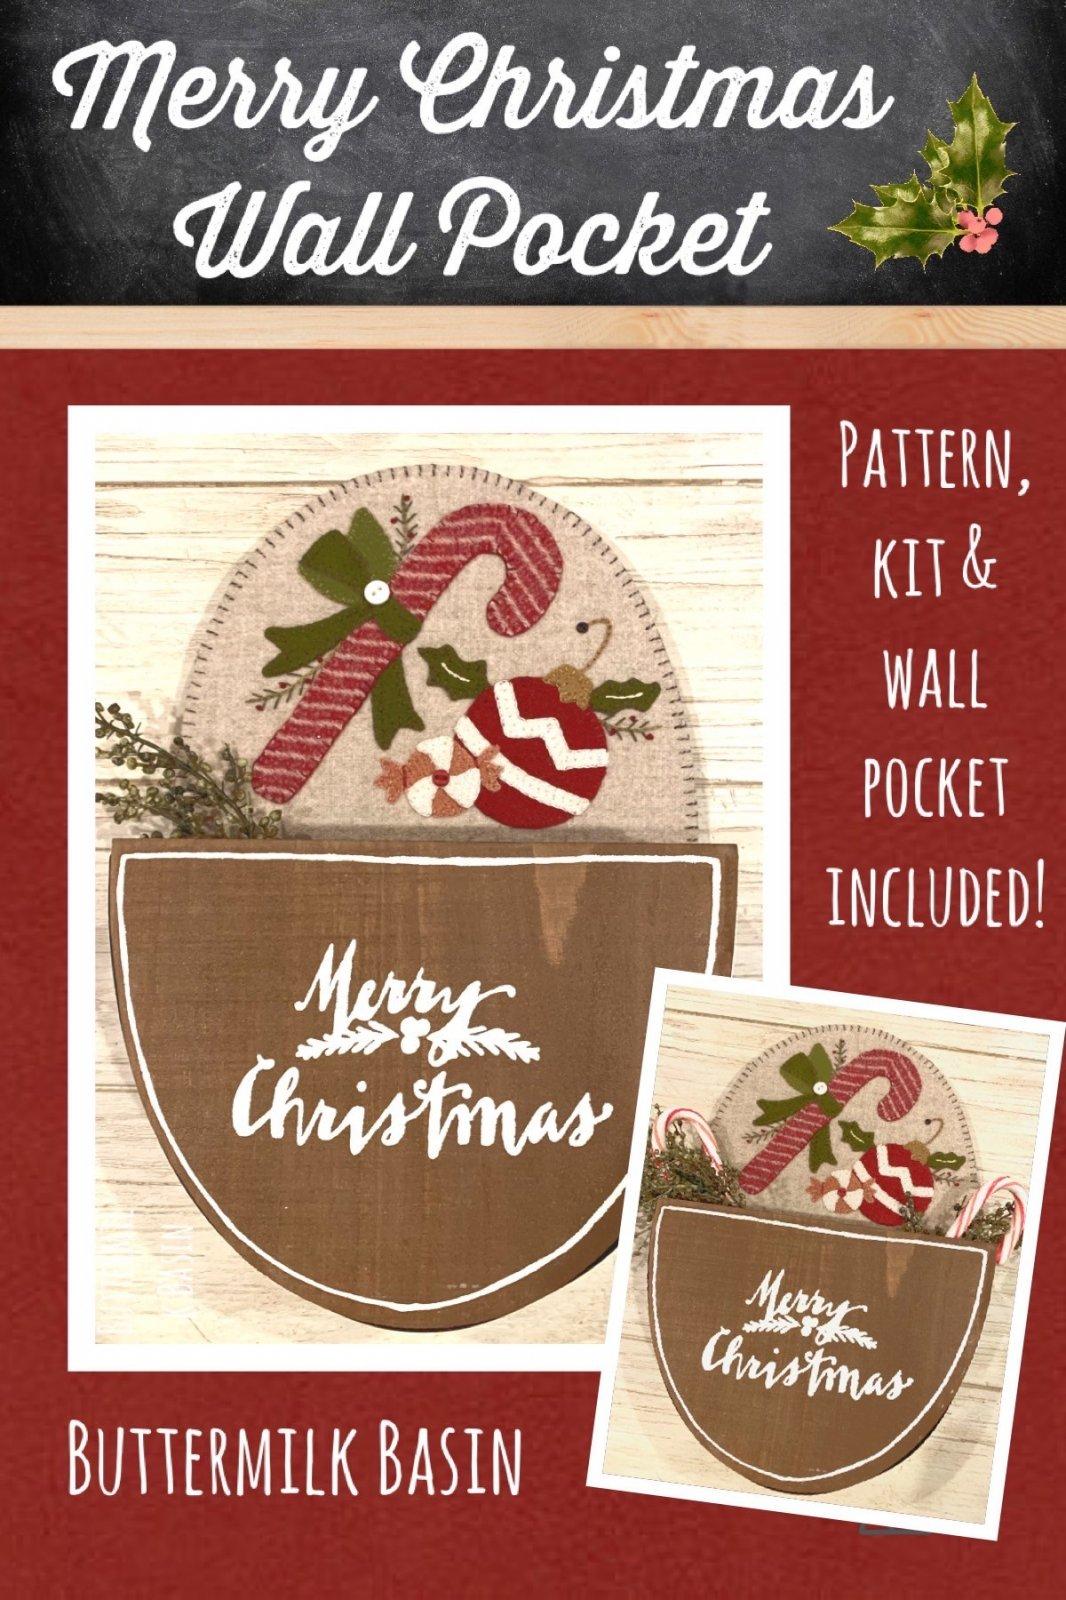 Merry Christmas Wall Pocket *Kit, Pattern & Wall Pocket